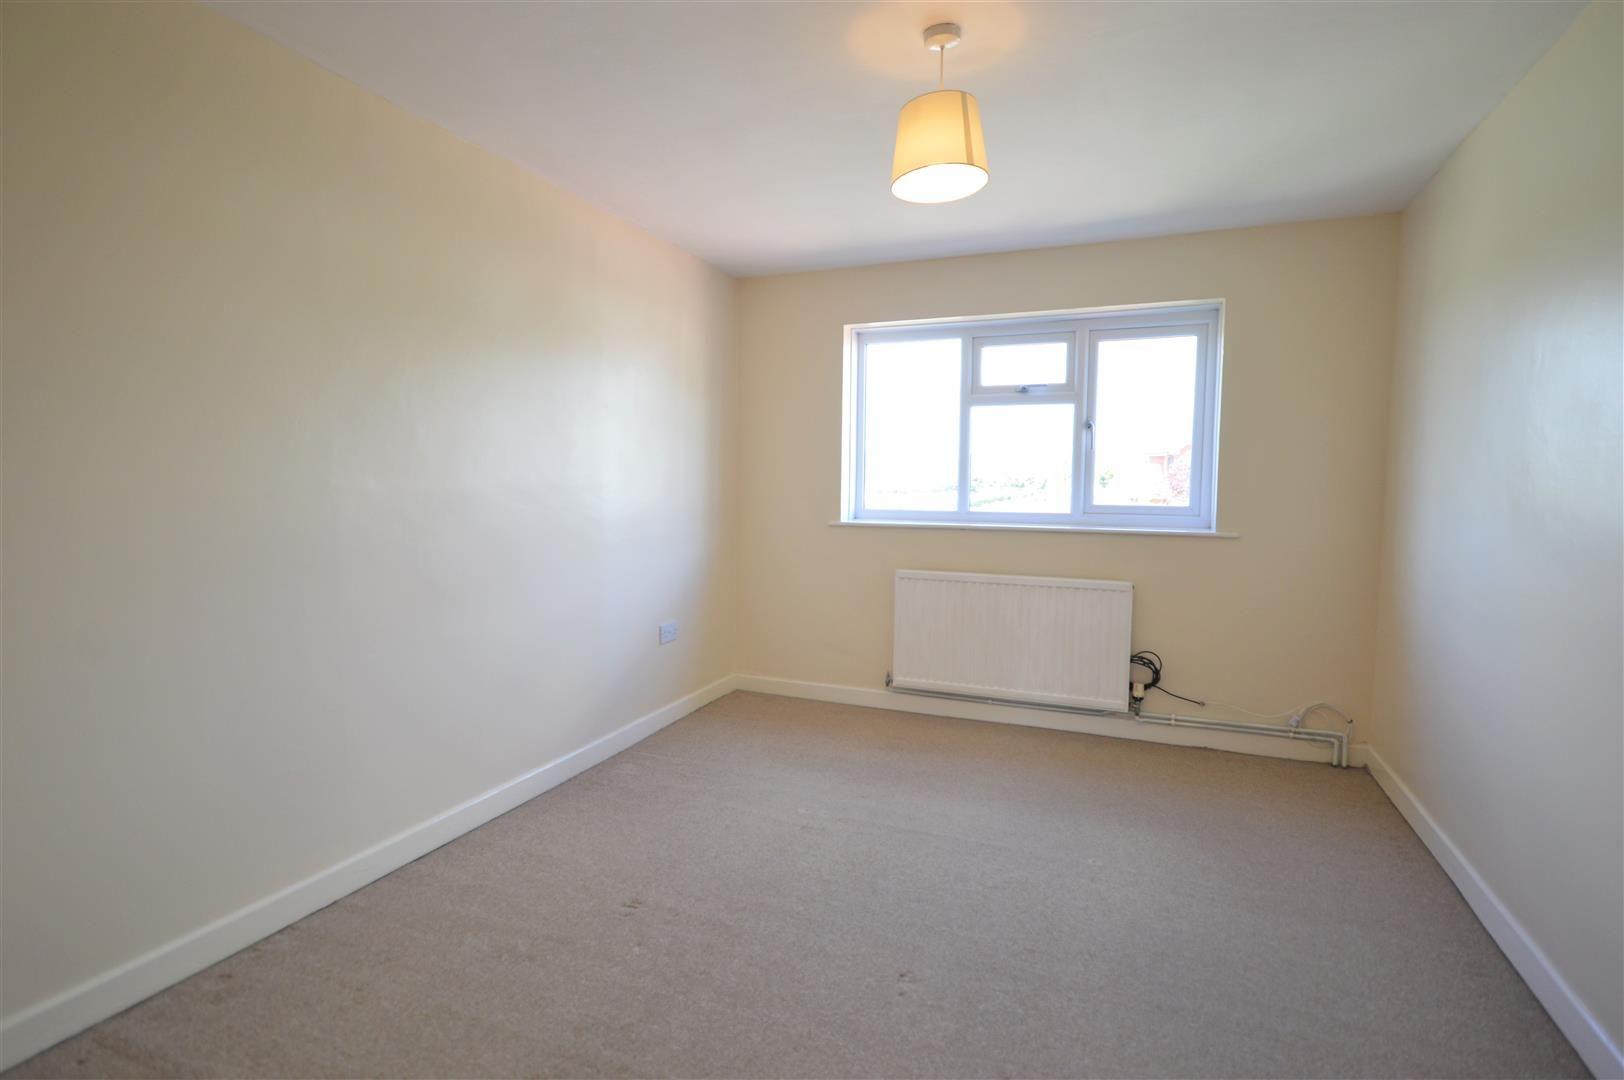 2 bed semi-detached for sale in Kingsland 6